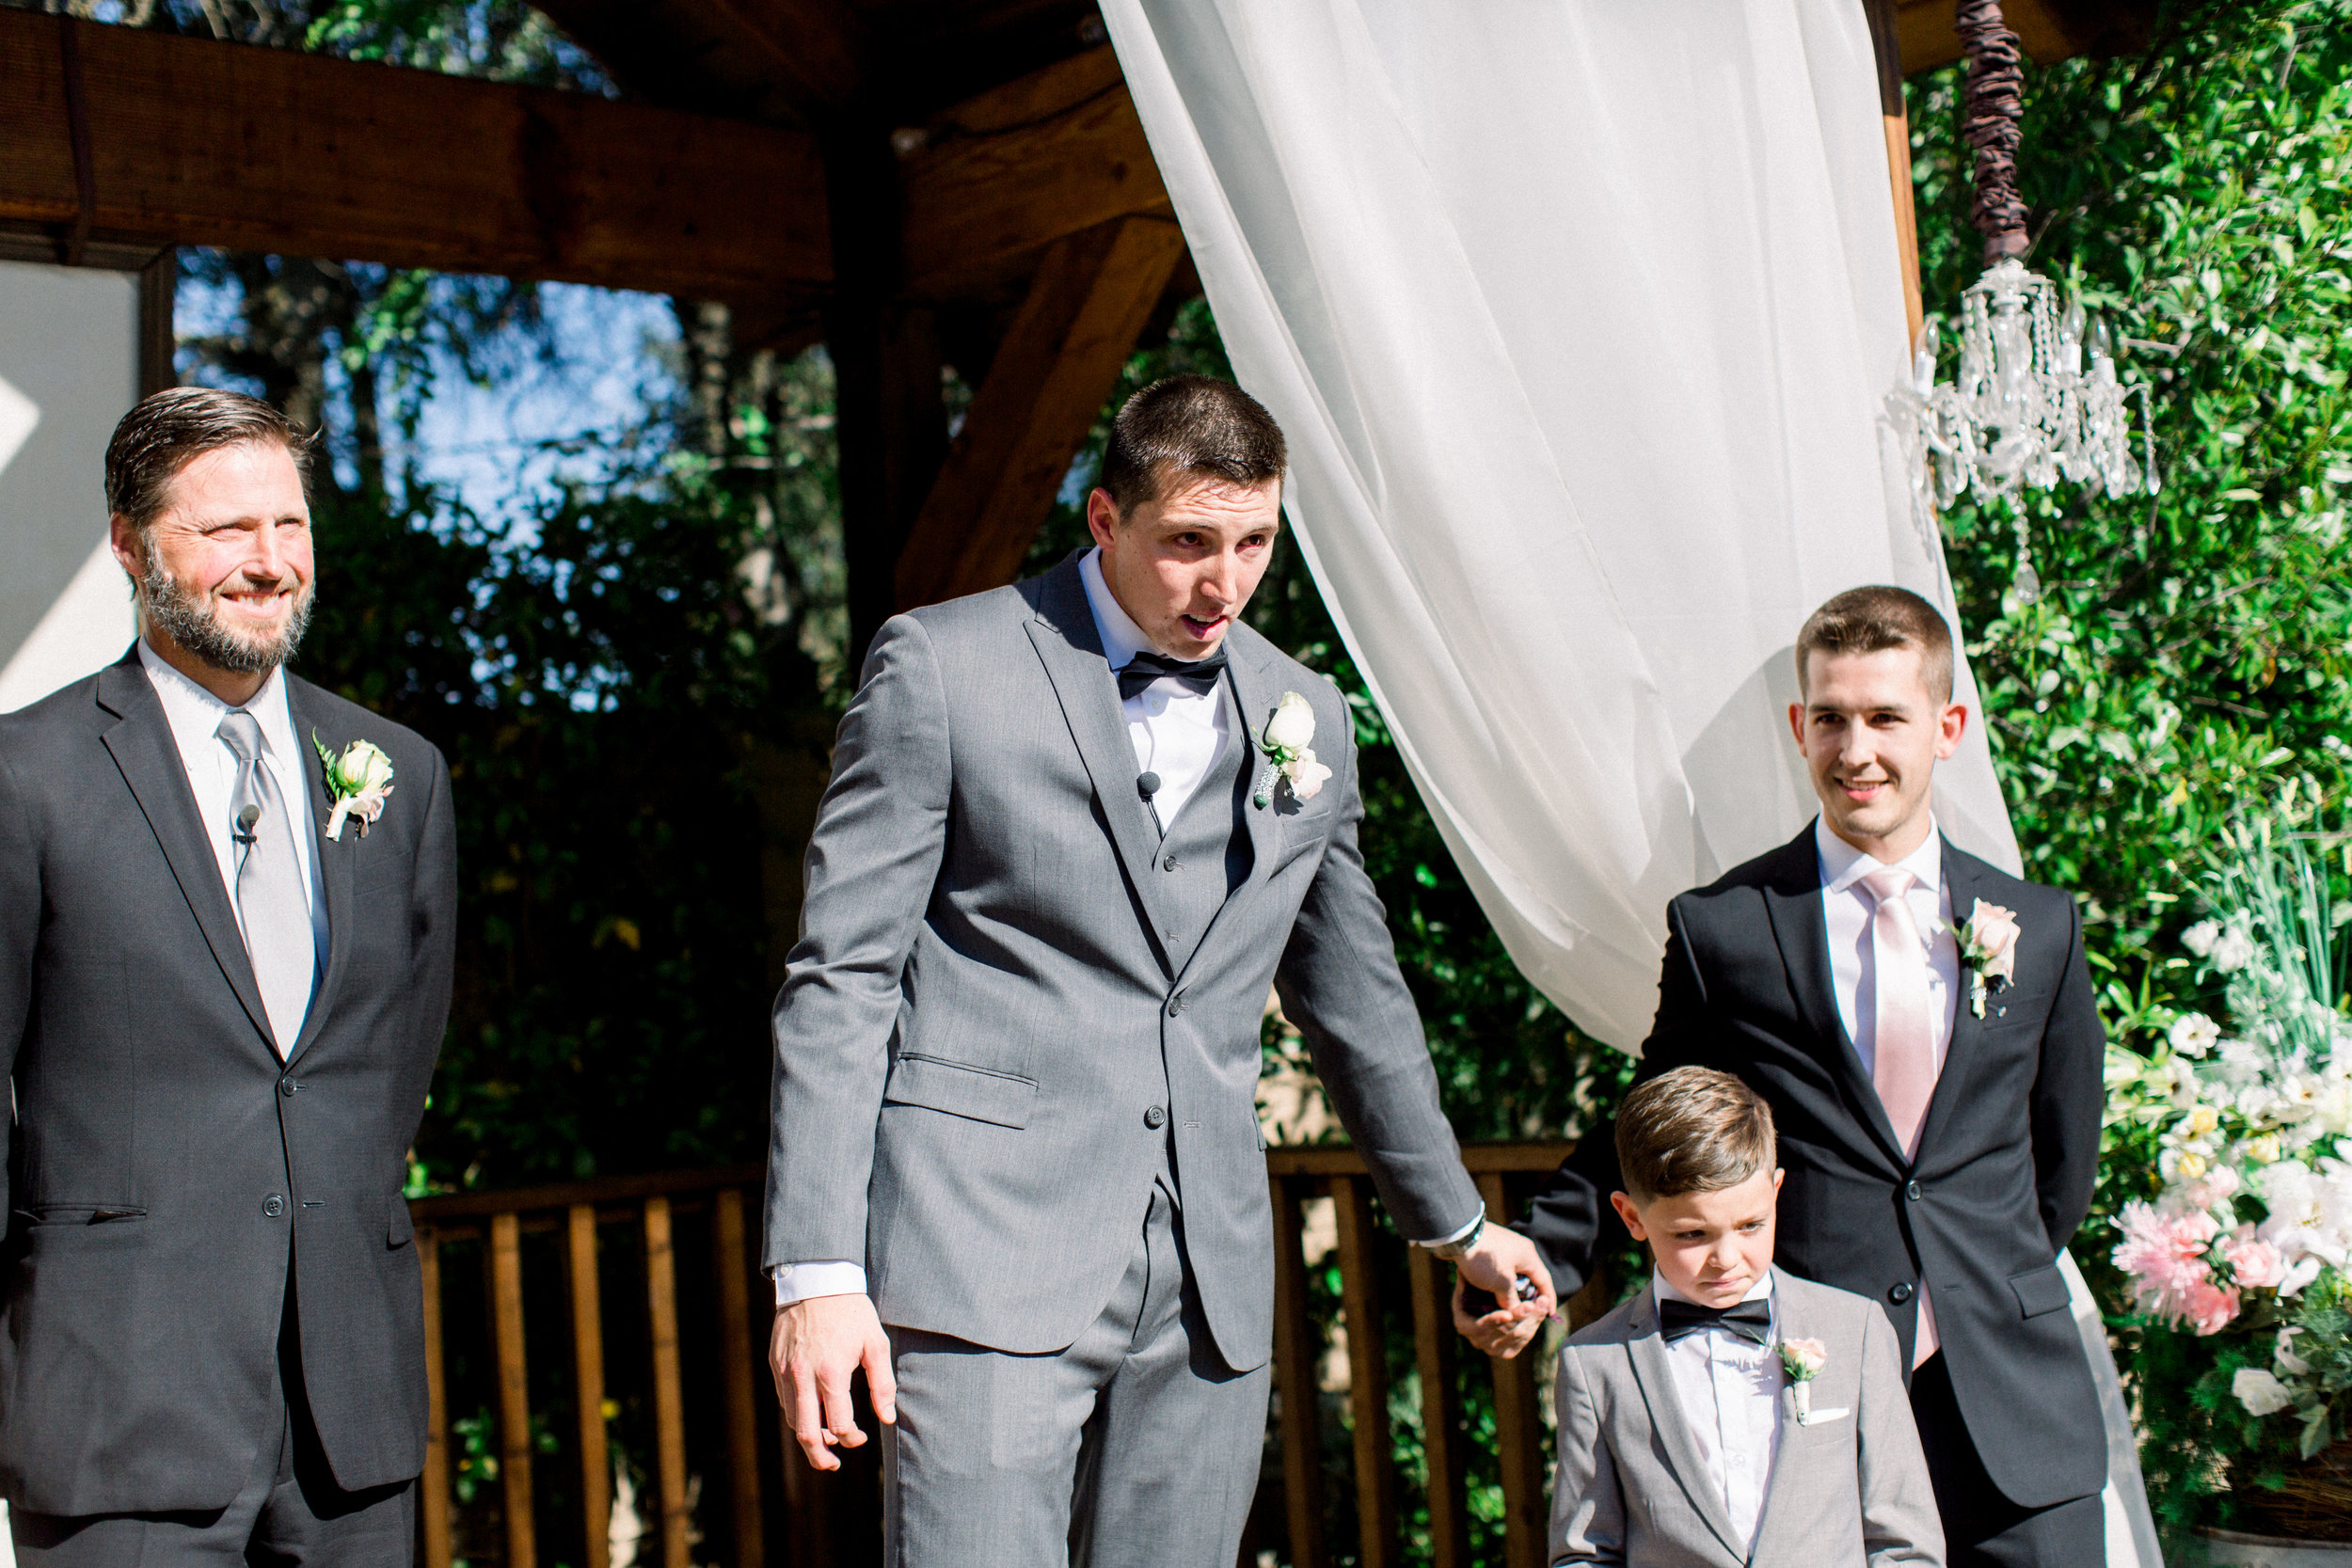 crooked-vine-winery-livemore-wedding-90.jpg